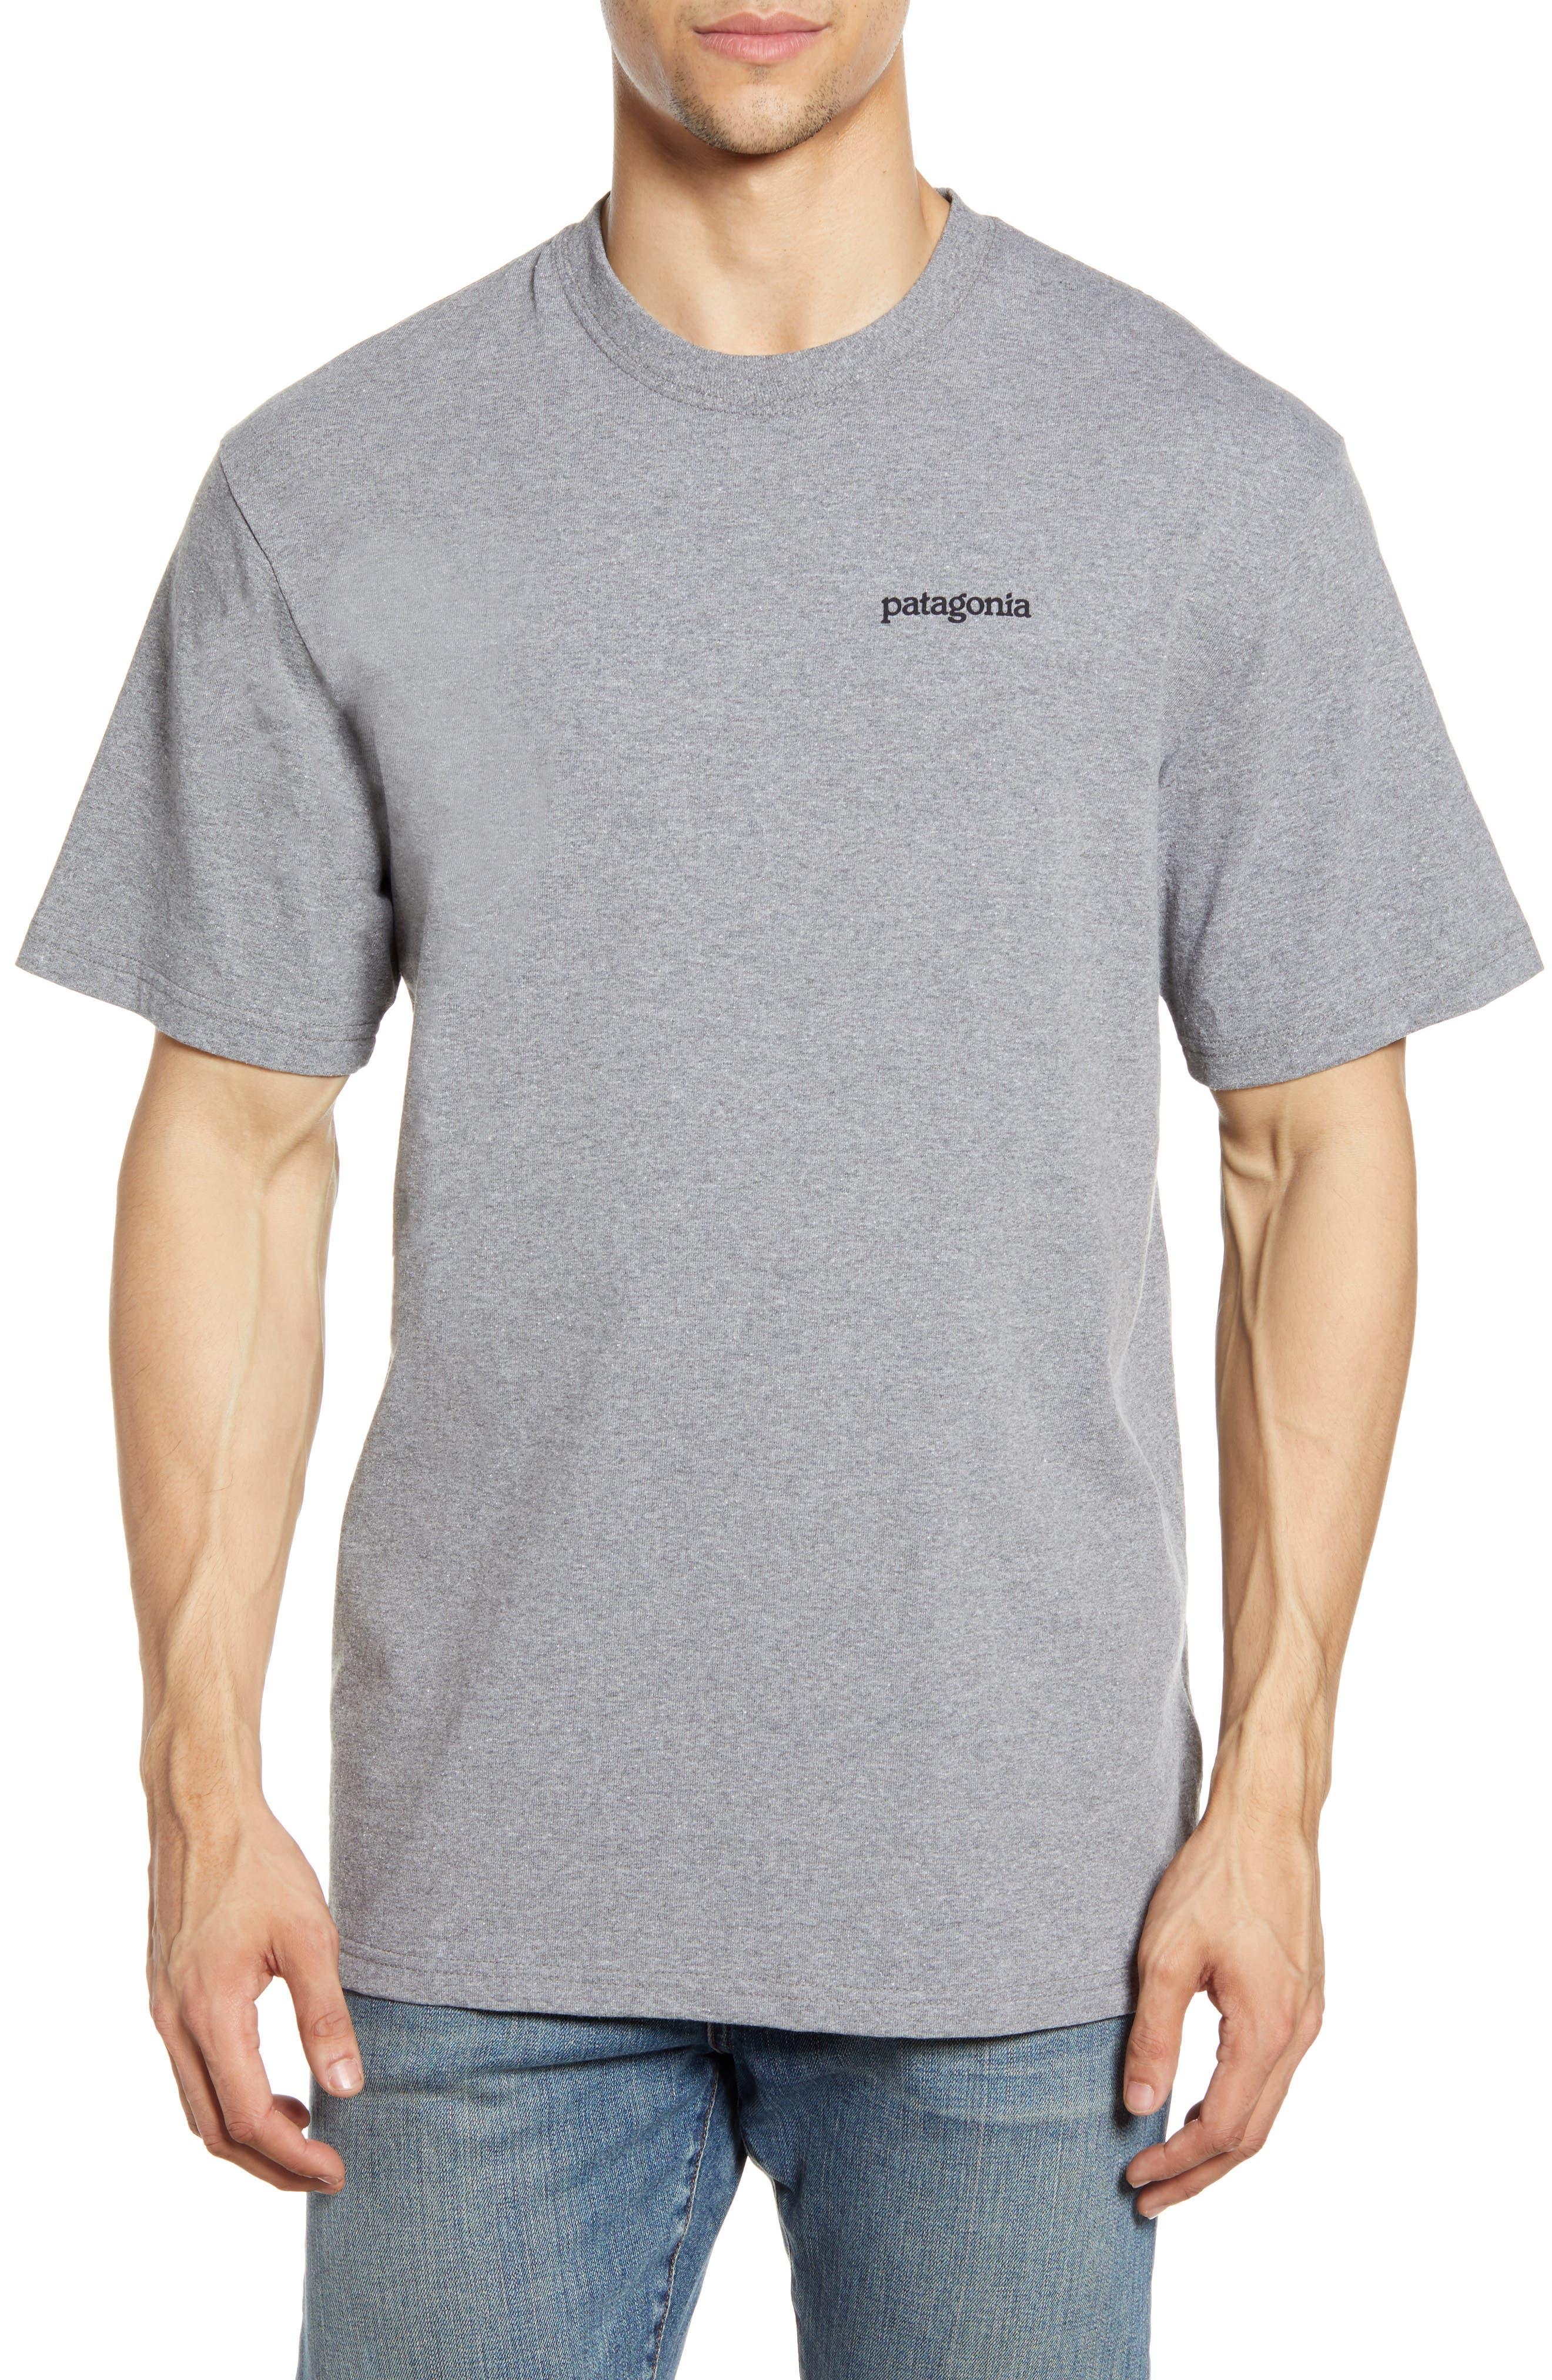 Patagonia Fitz Roy Horizons Graphic Responsibili-Tee T-Shirt, Black